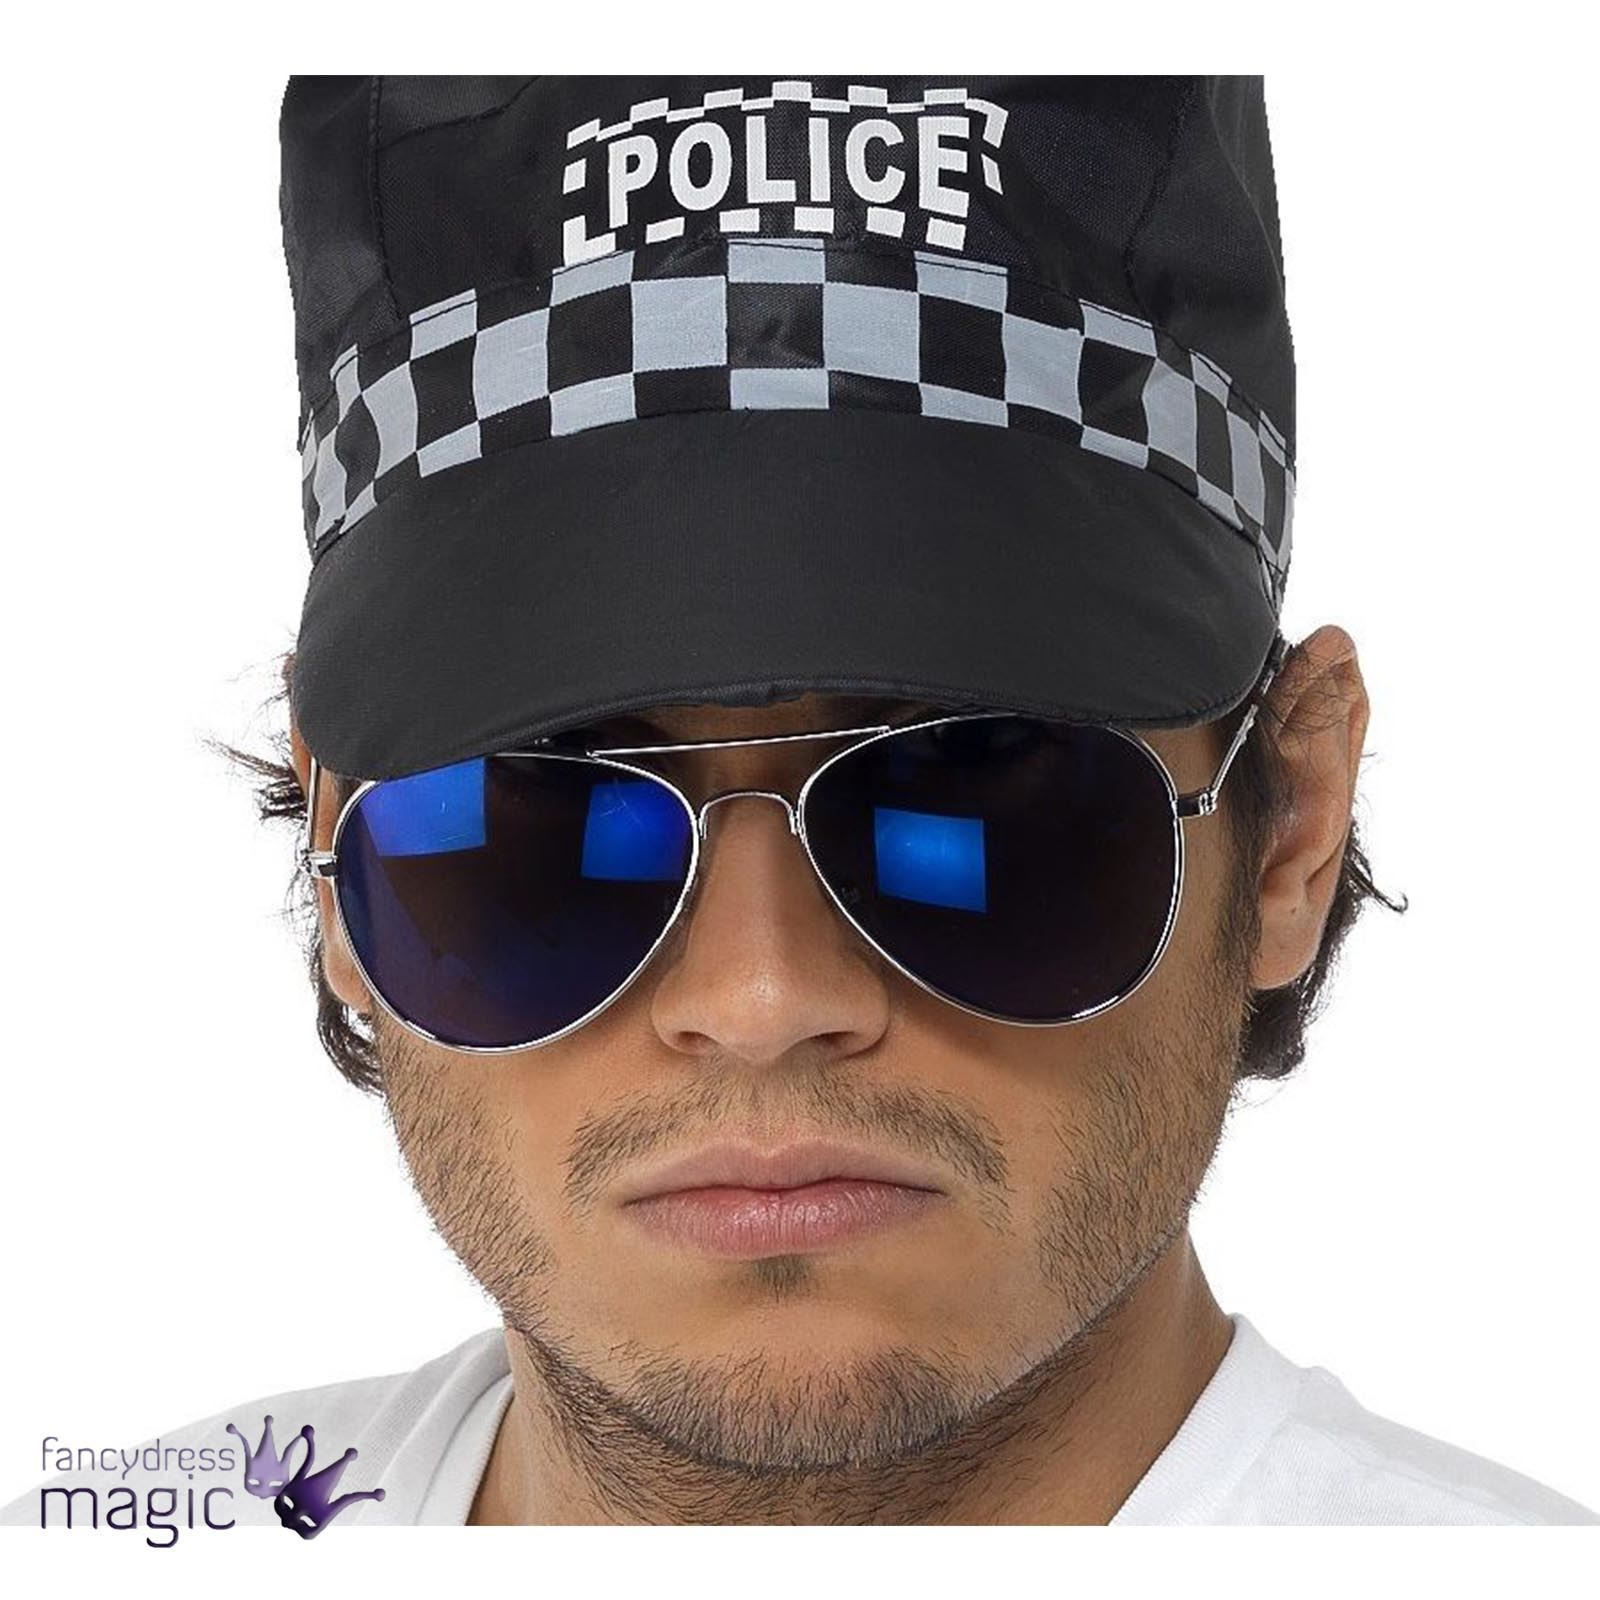 29d885466fc Cop Police CHiPs Biker SWAT Pilot Blue Mirror Aviator Sunglasses Specs  Glasses